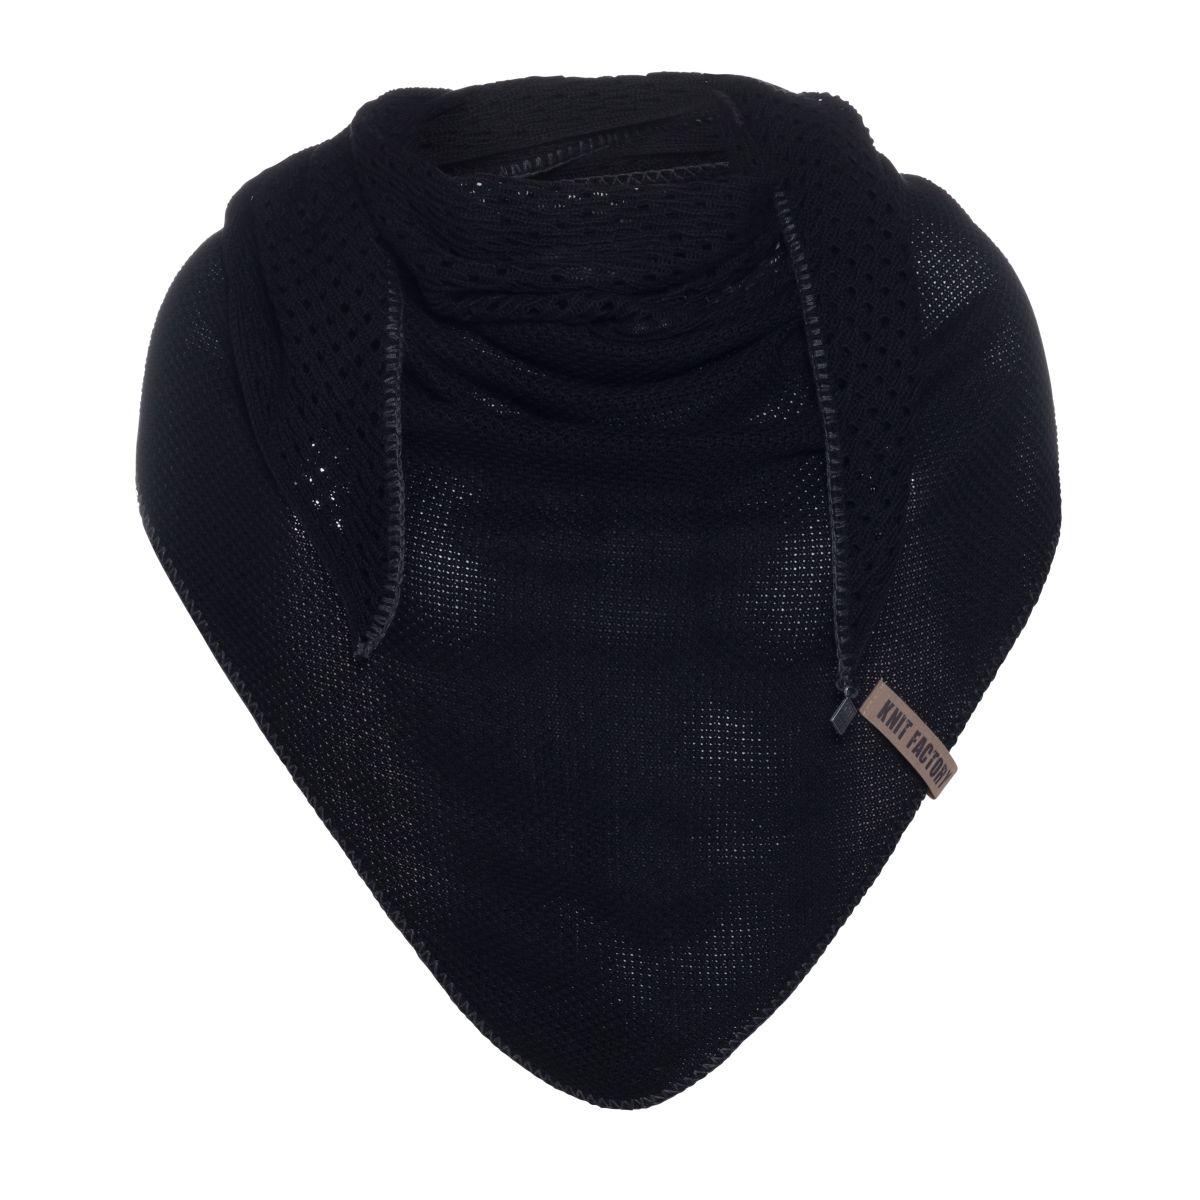 april triangle scarf black